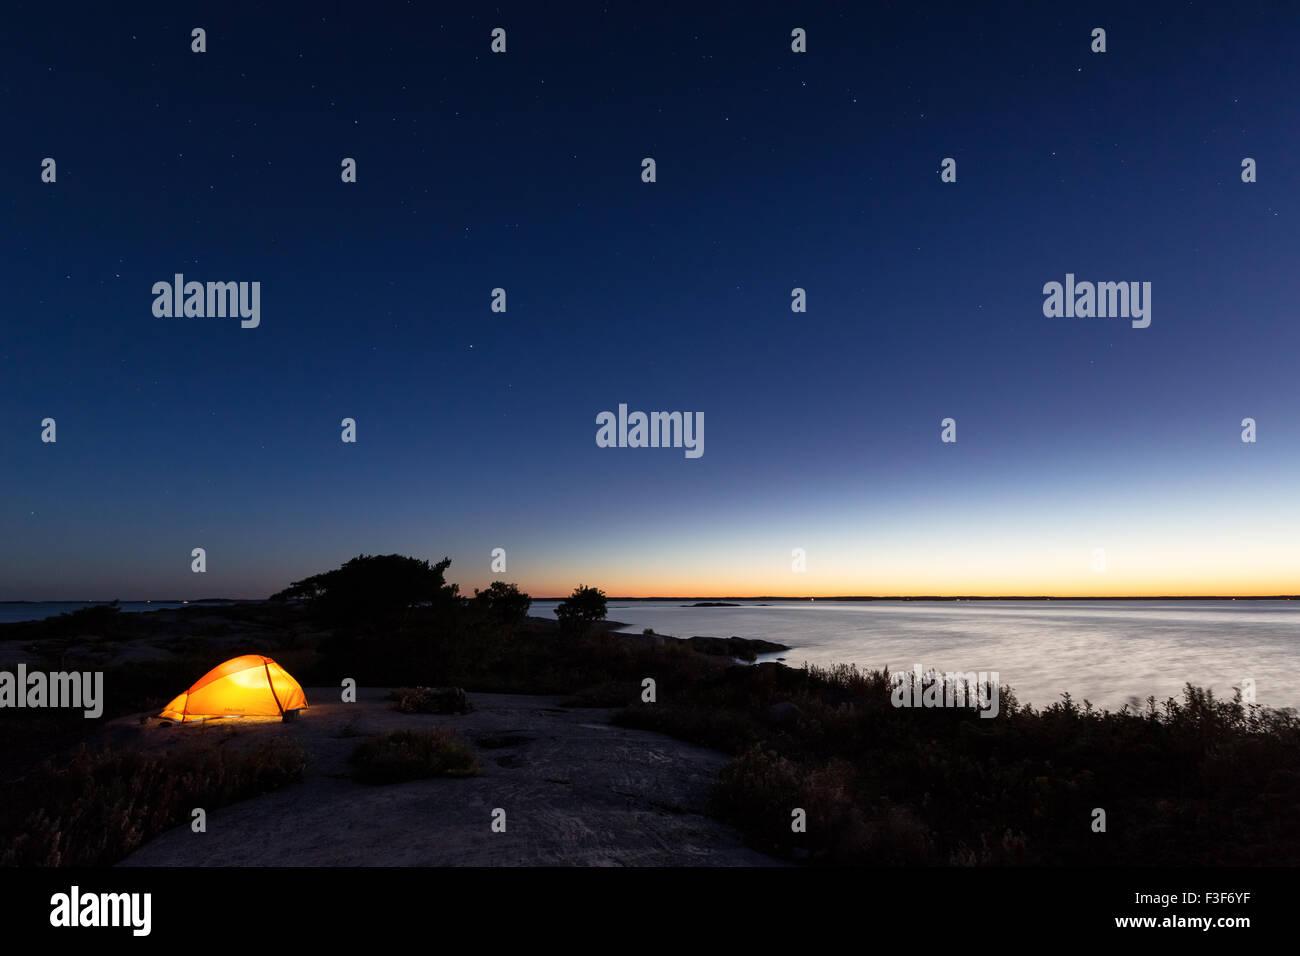 Notte arriva a Örskär isola, Espoo, Finlandia, Europa, UE Immagini Stock